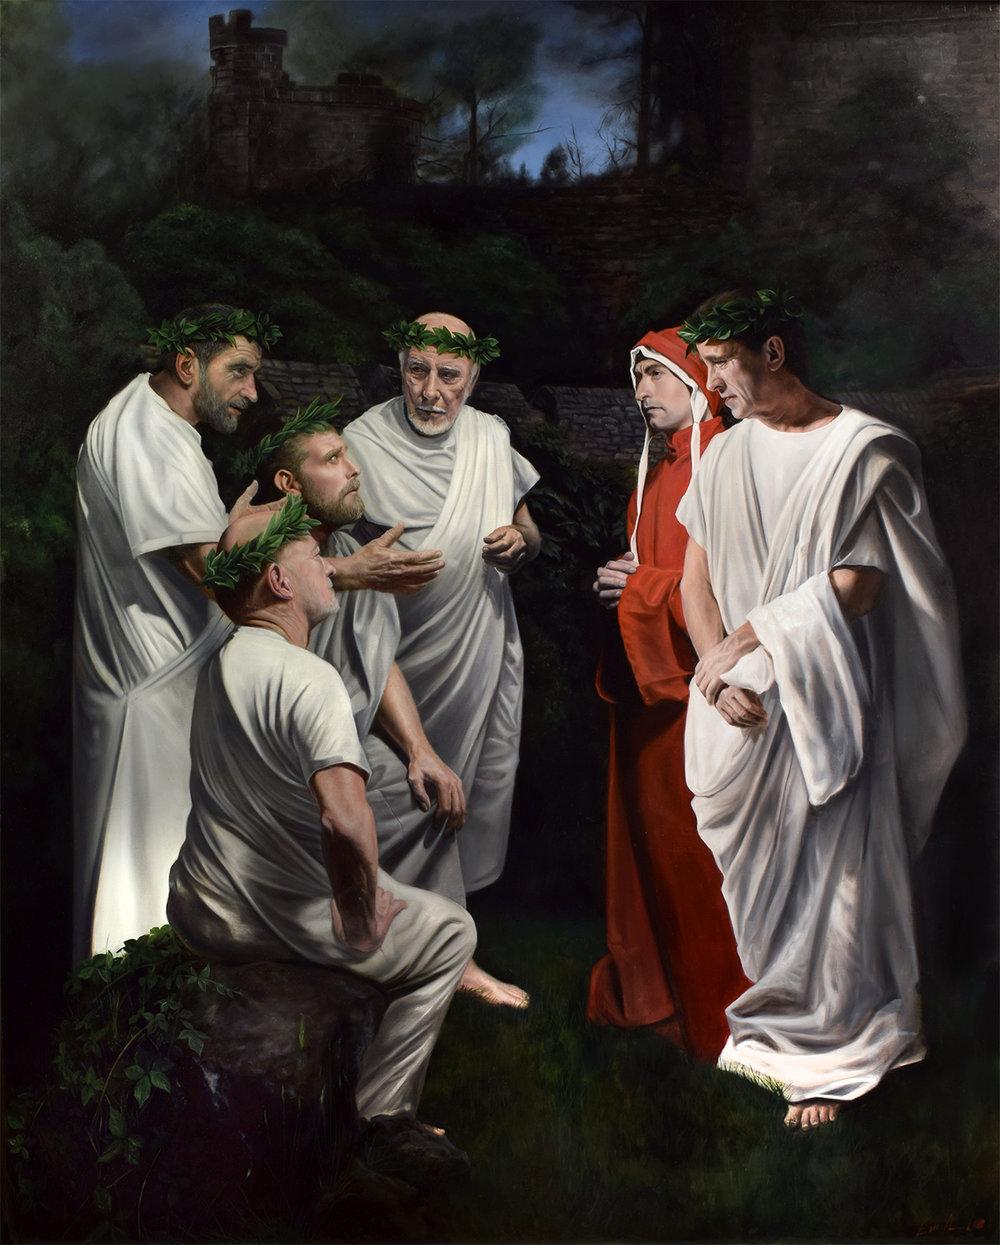 canto-4-dante-virgil-poets-antiquity-limbo-web.jpg